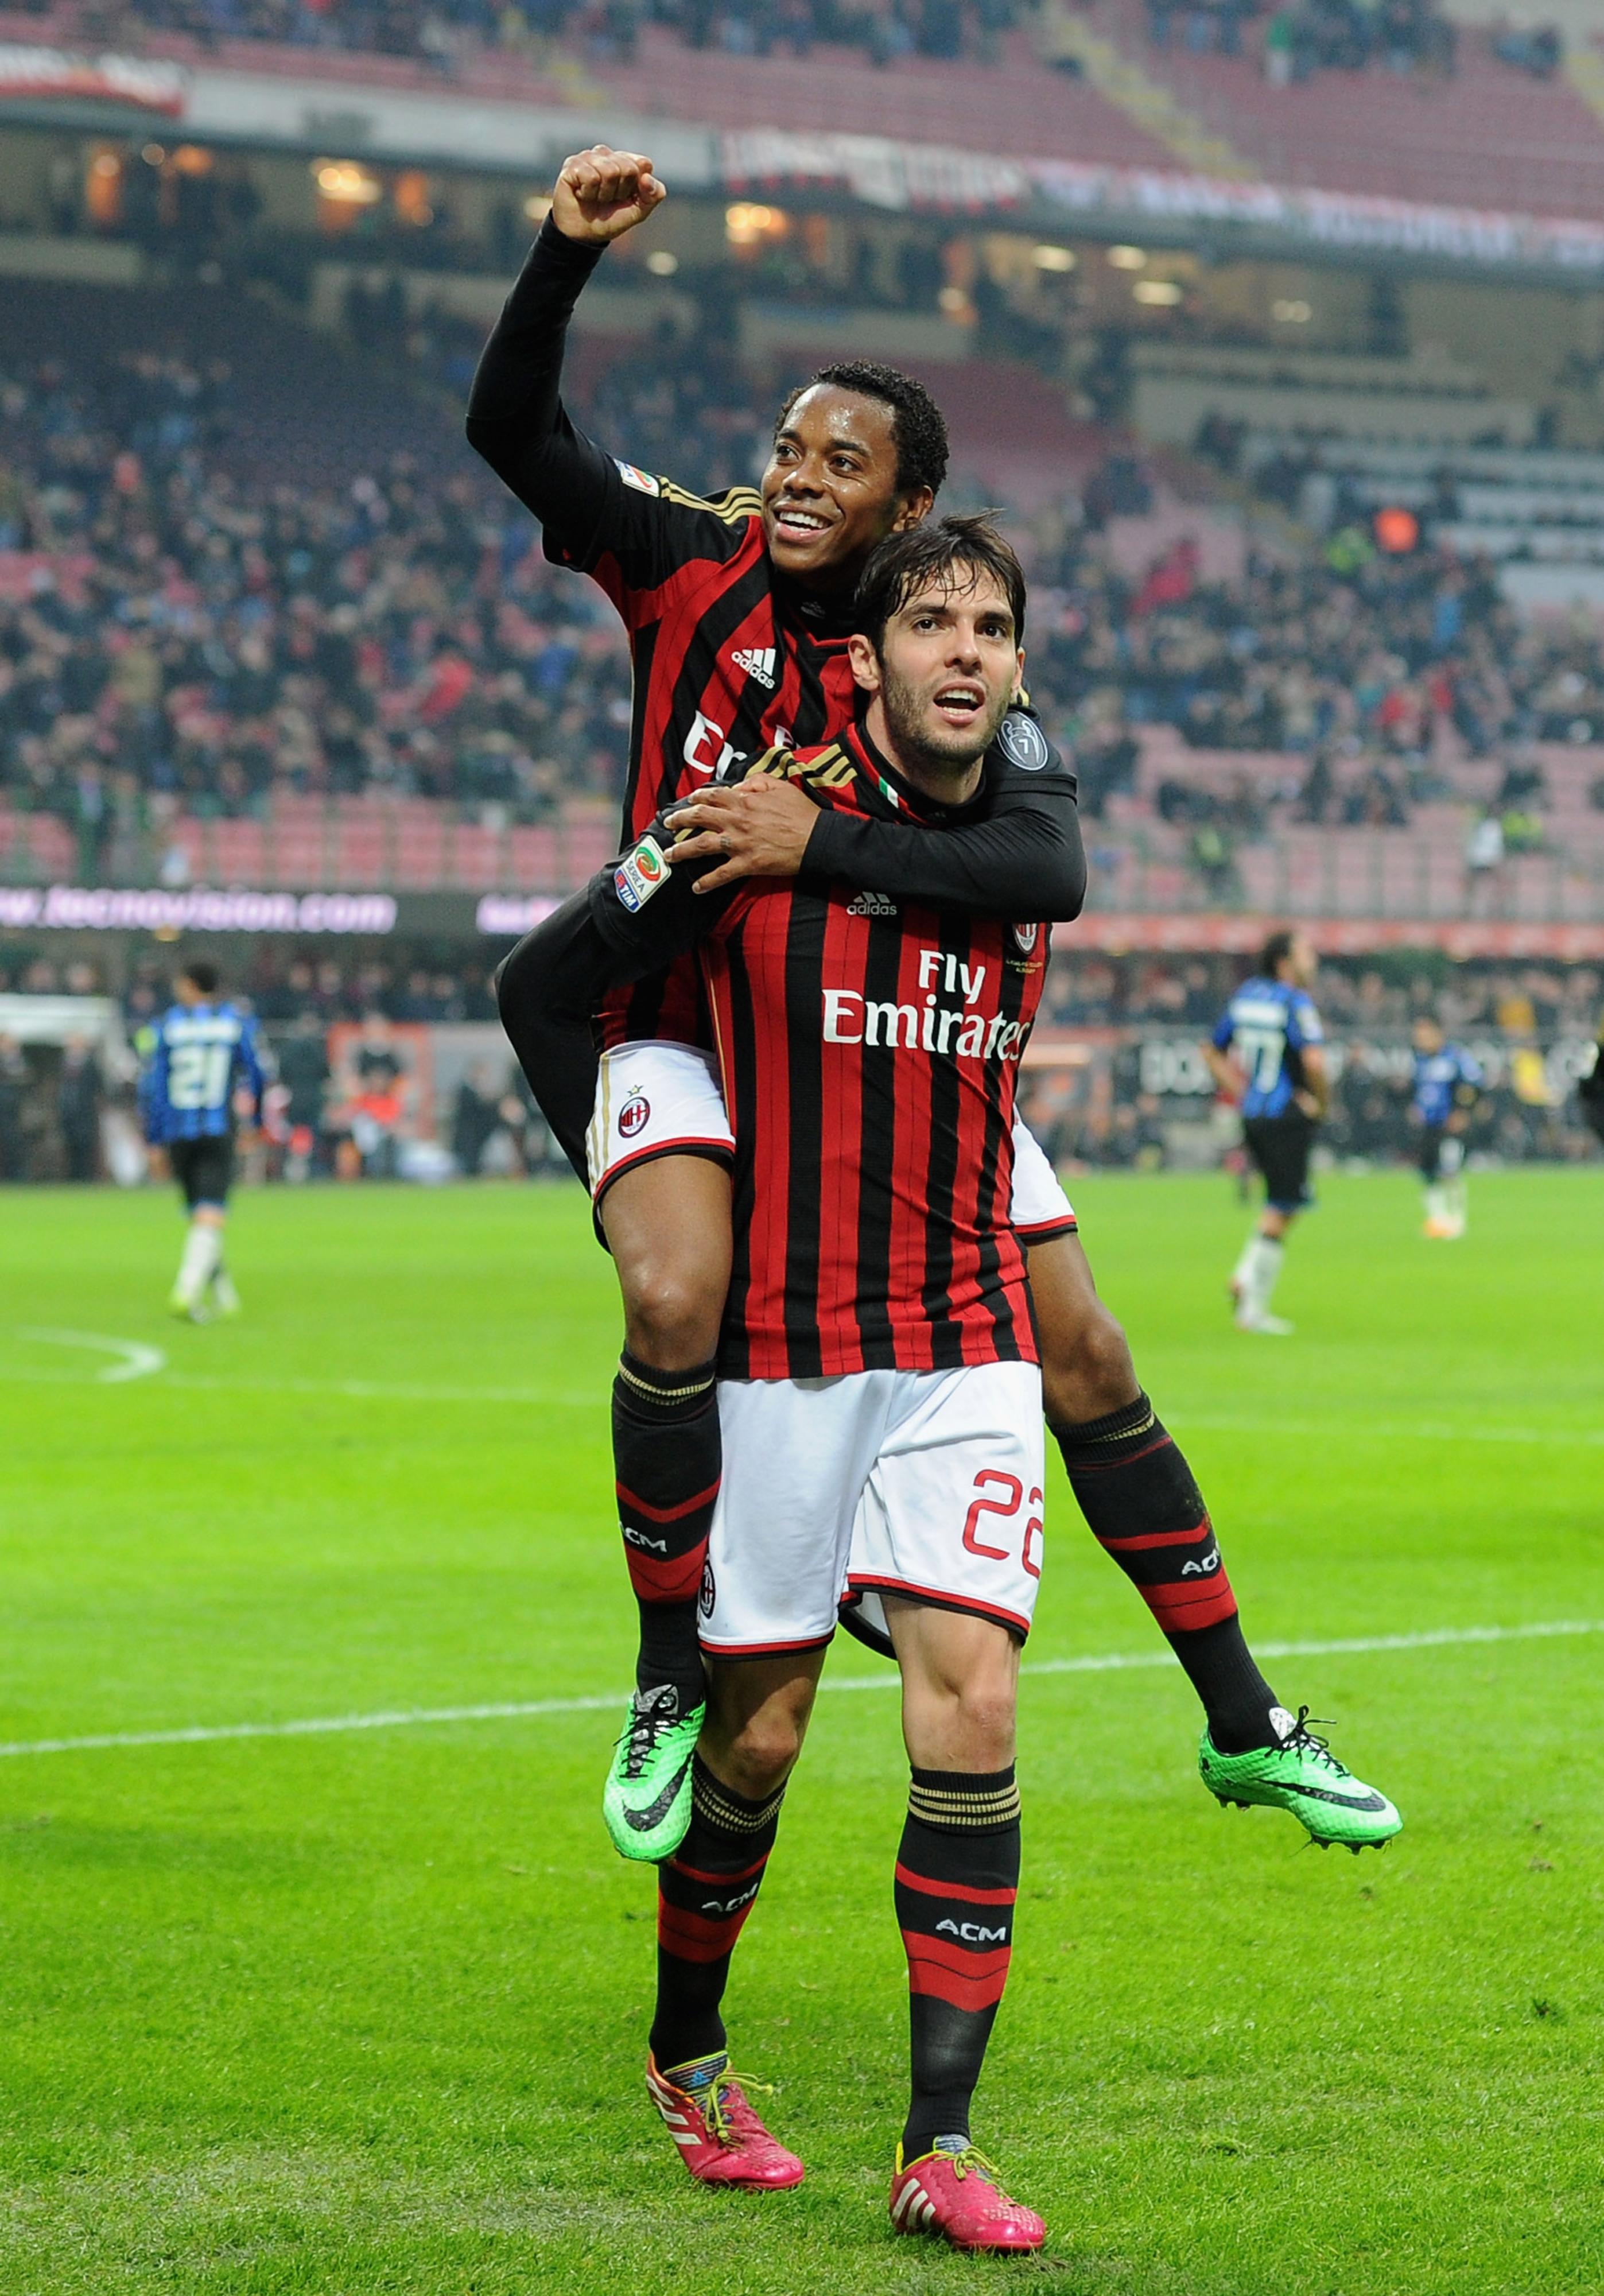 Serie A, Week 18: Napoli, AC Milan pick up wins on Monday